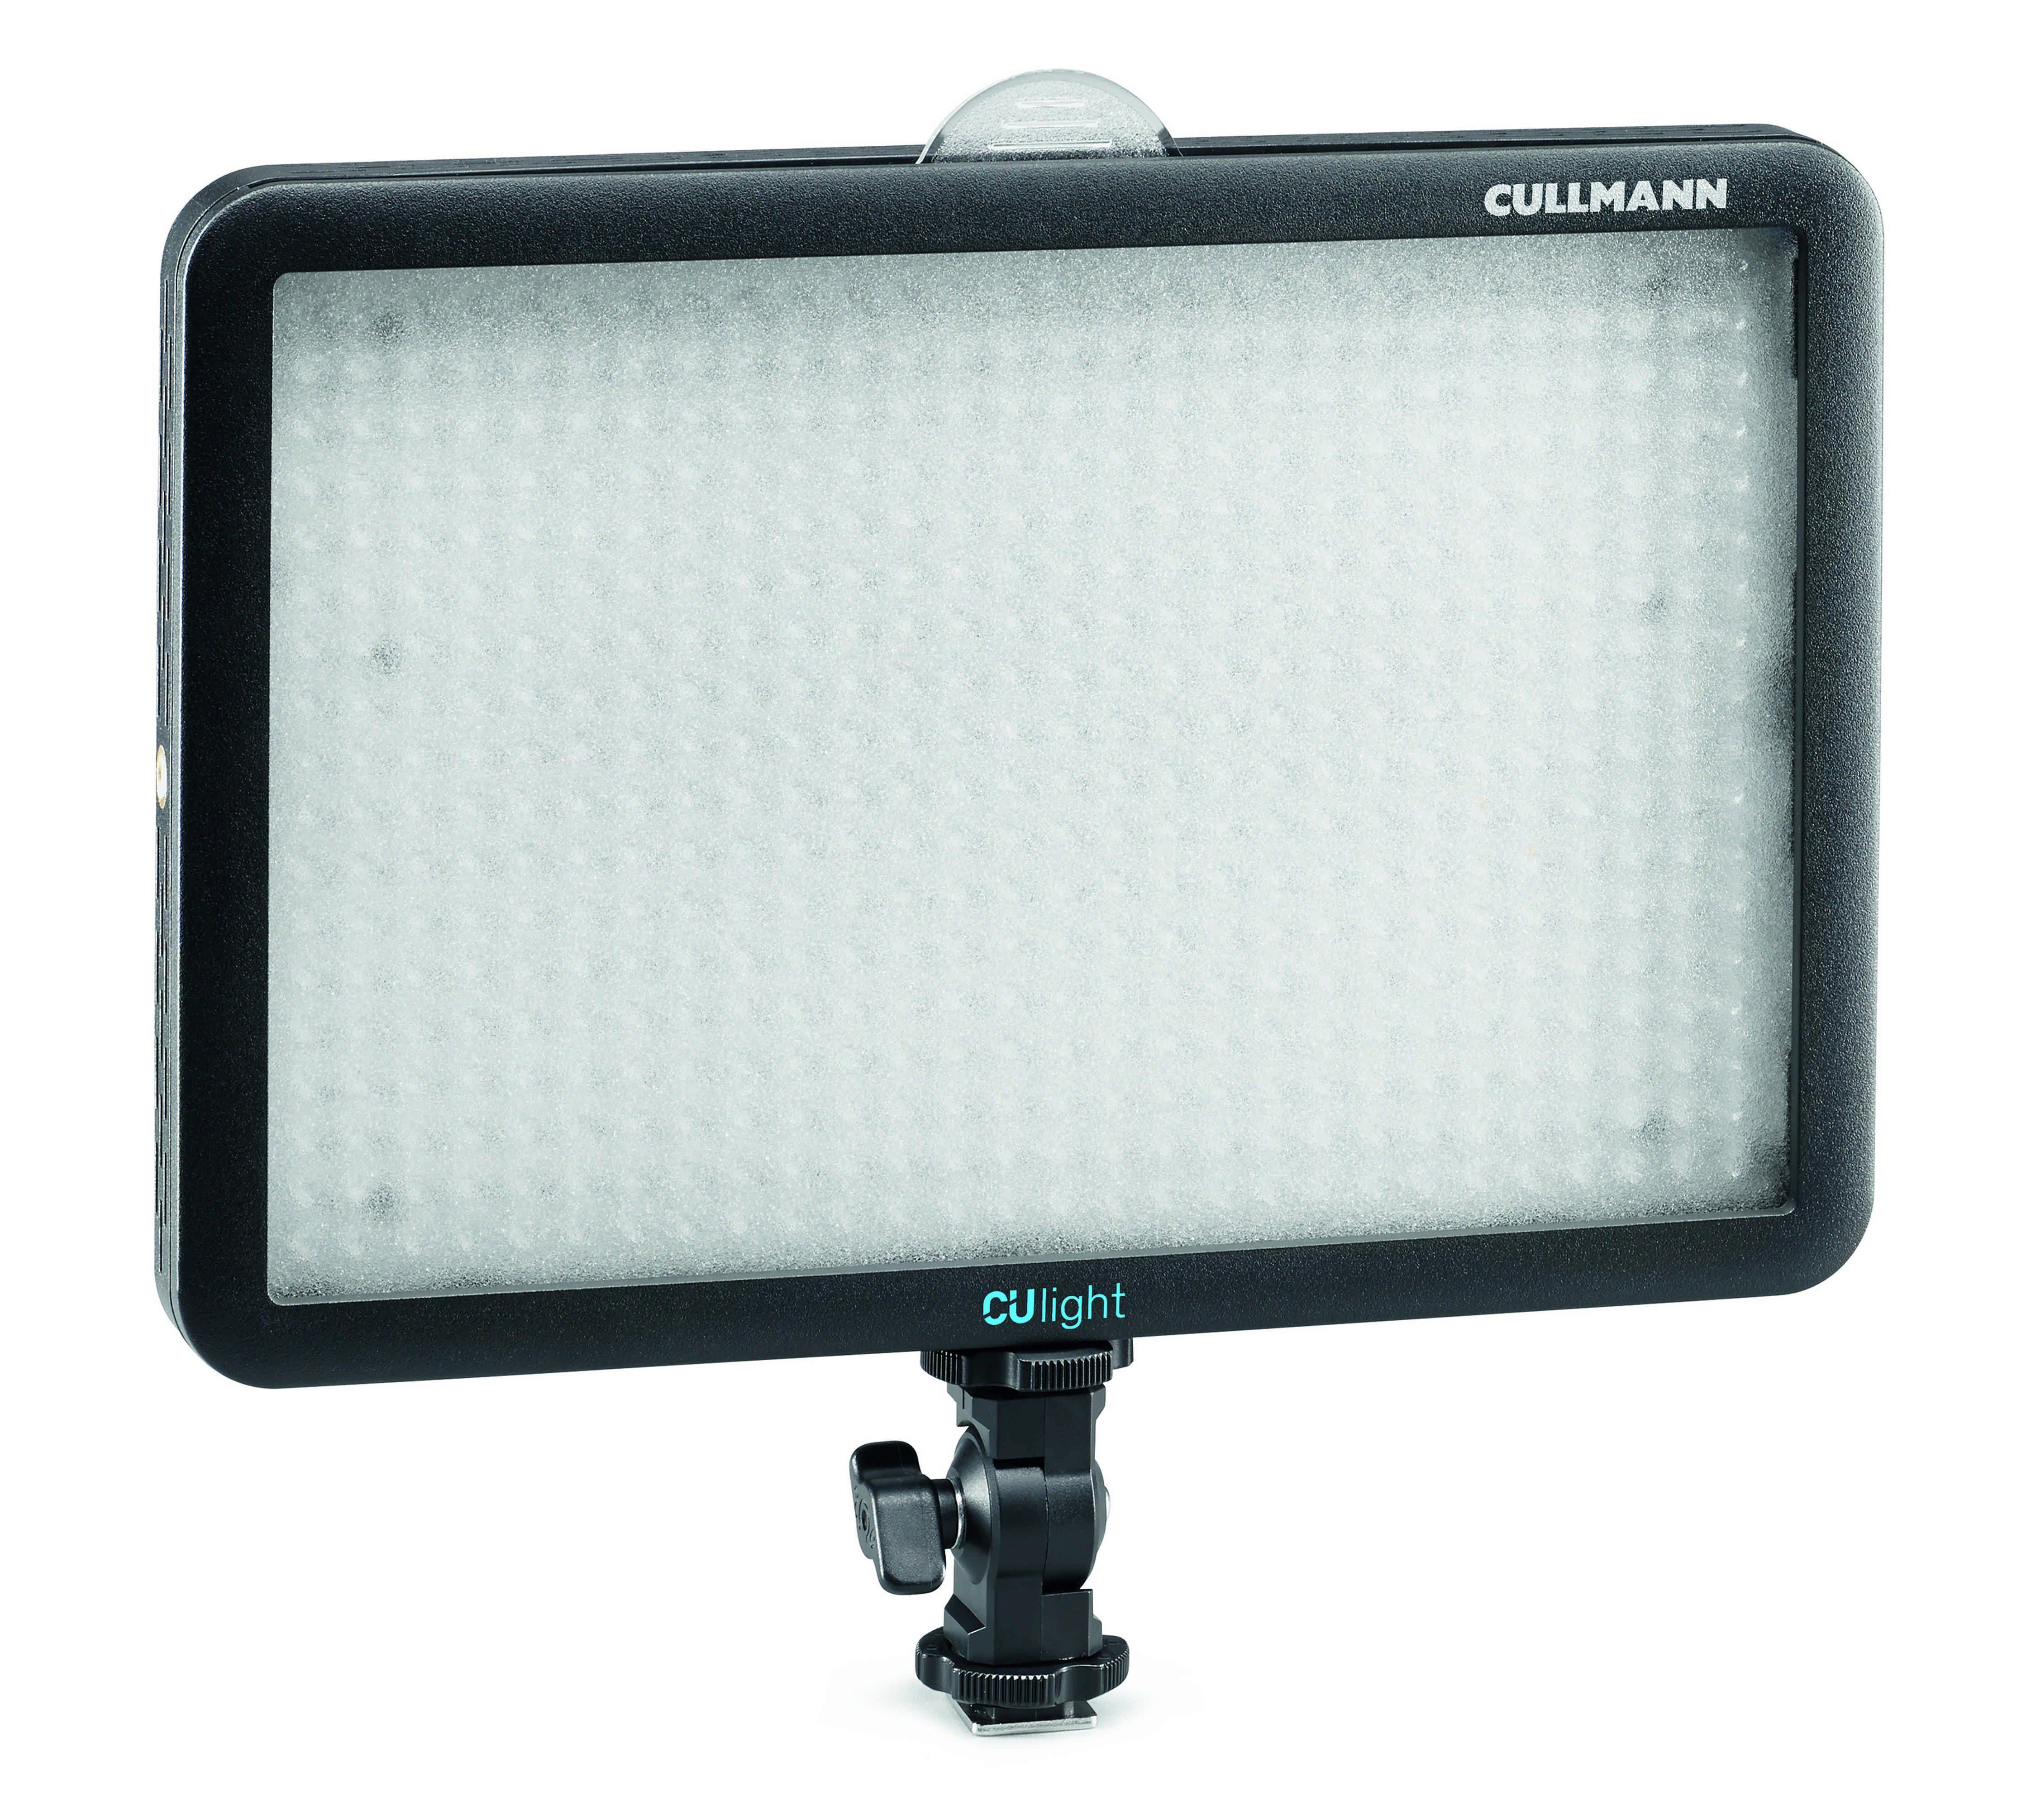 Cullmann LED Videoleuchte inkl. Diffusionsscheibe und -filter »CUlight VR 2900DL«